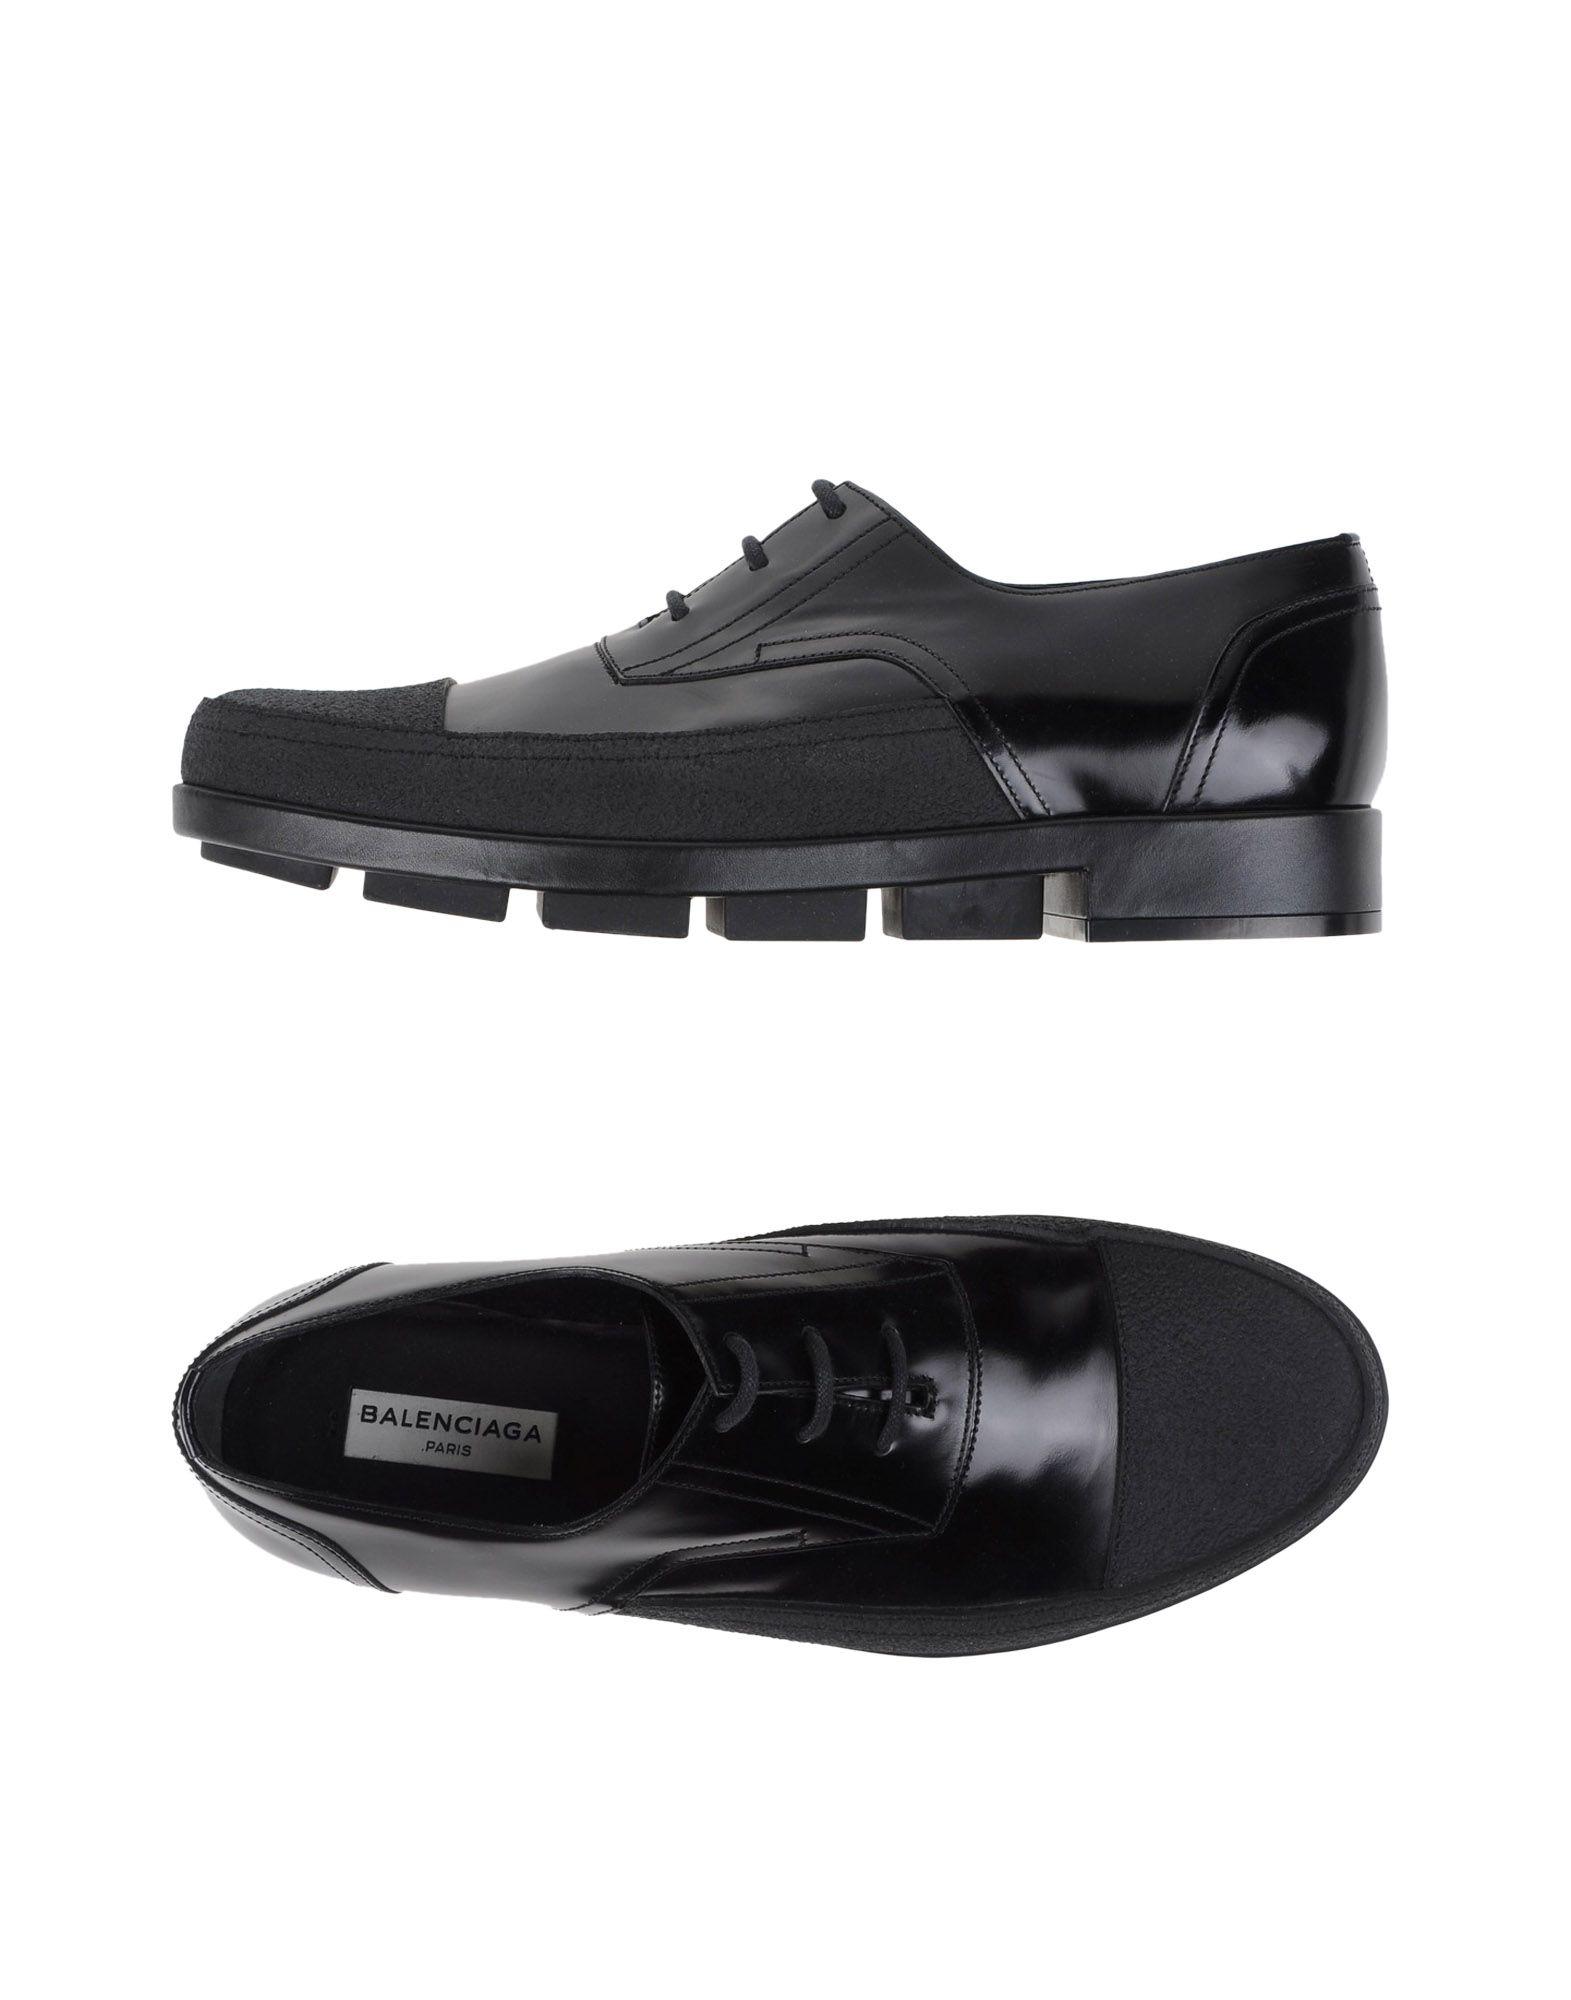 BALENCIAGA Lace-up shoes - Item 11072472